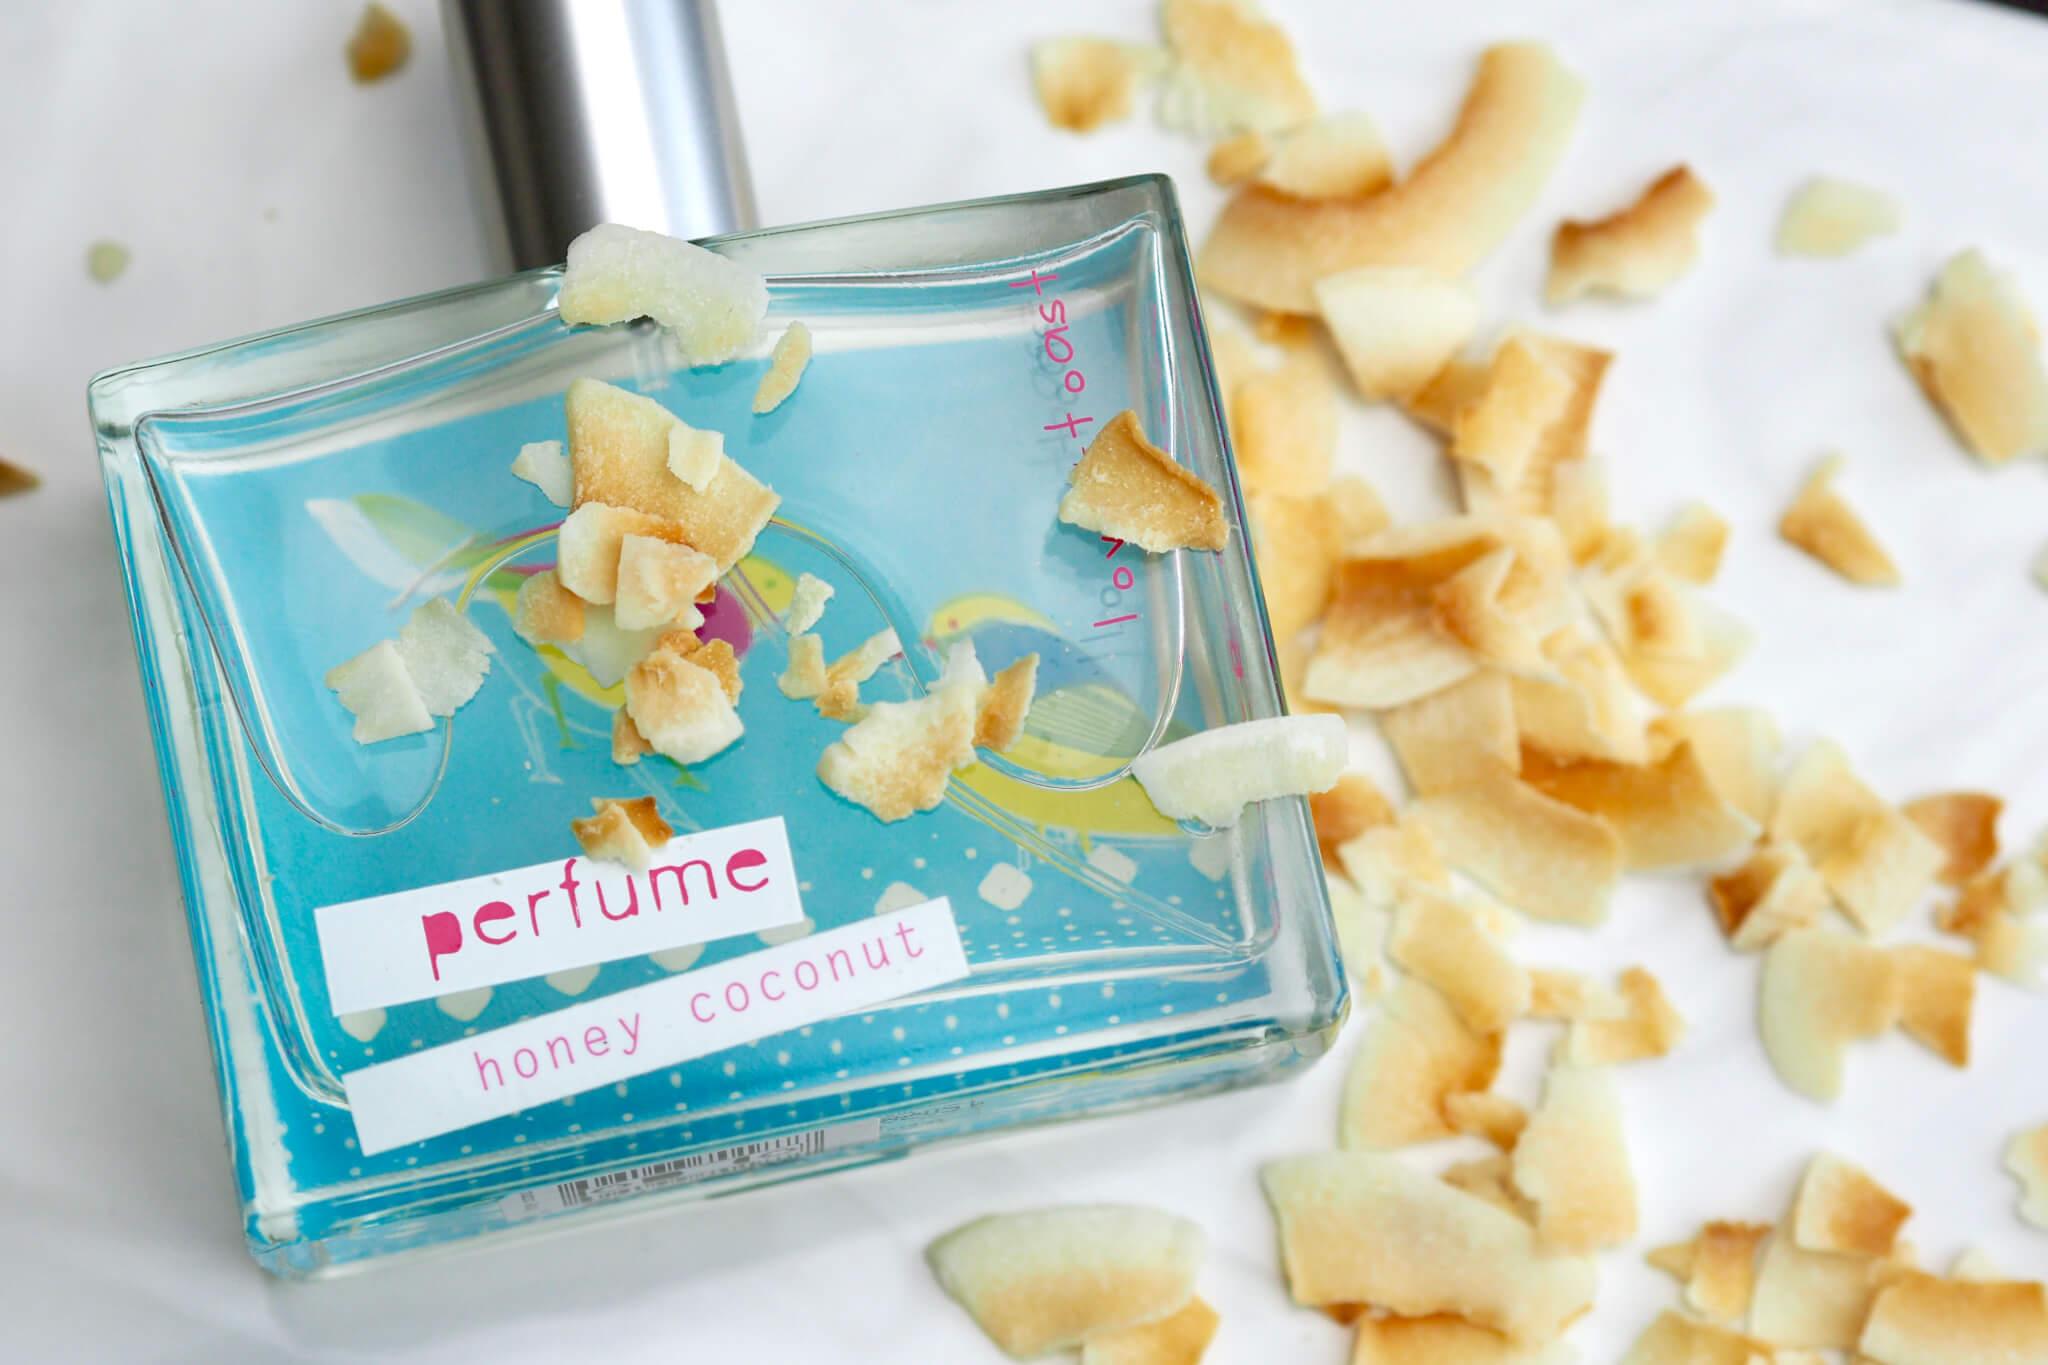 naturlig parfym